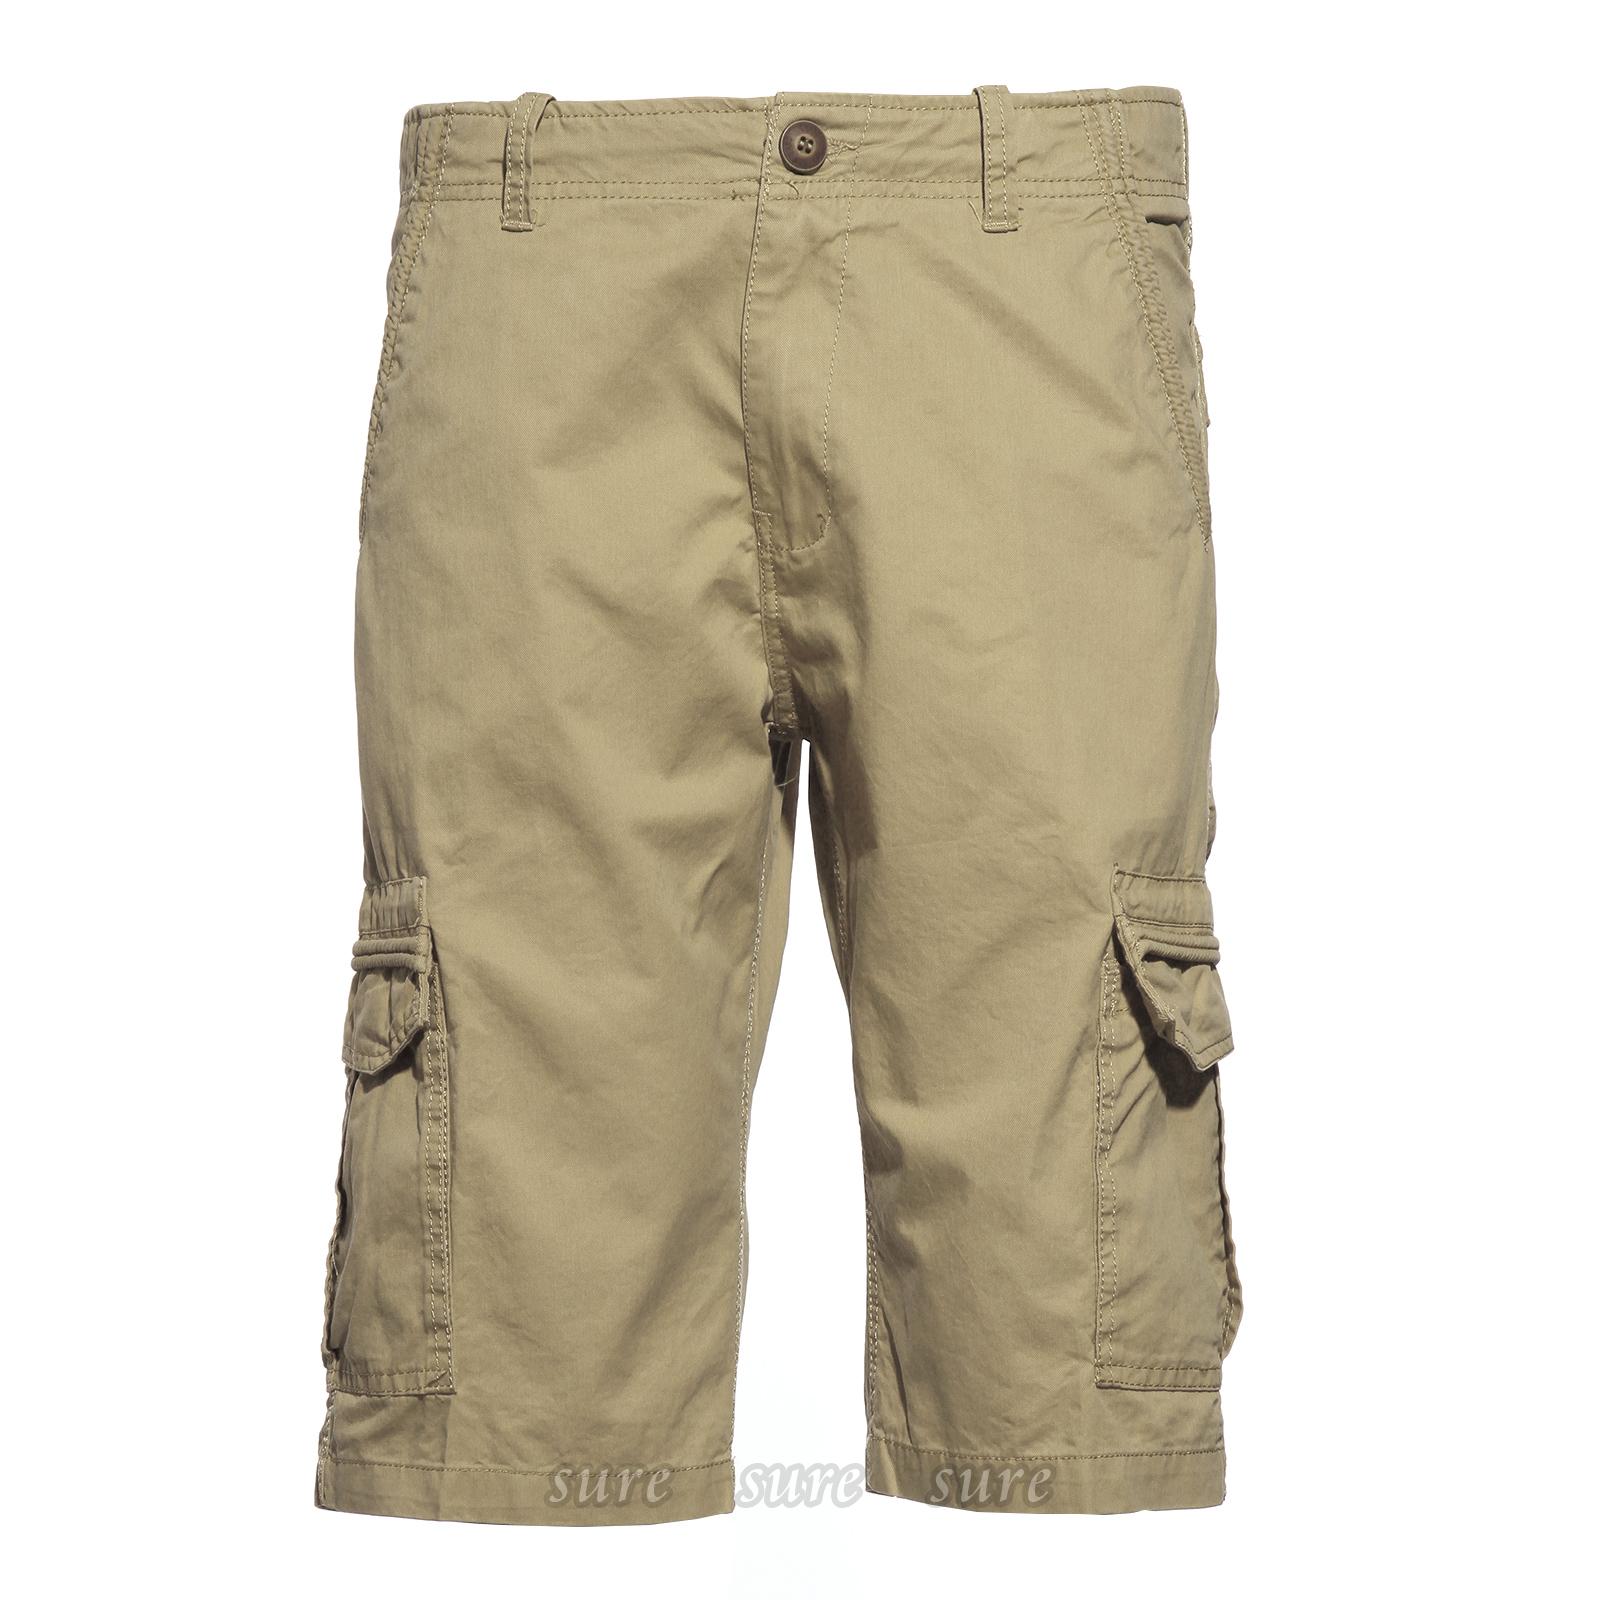 cargo pantacourt bermuda pantalon short homme sport 36 38 40 3couleur style 3 ebay. Black Bedroom Furniture Sets. Home Design Ideas